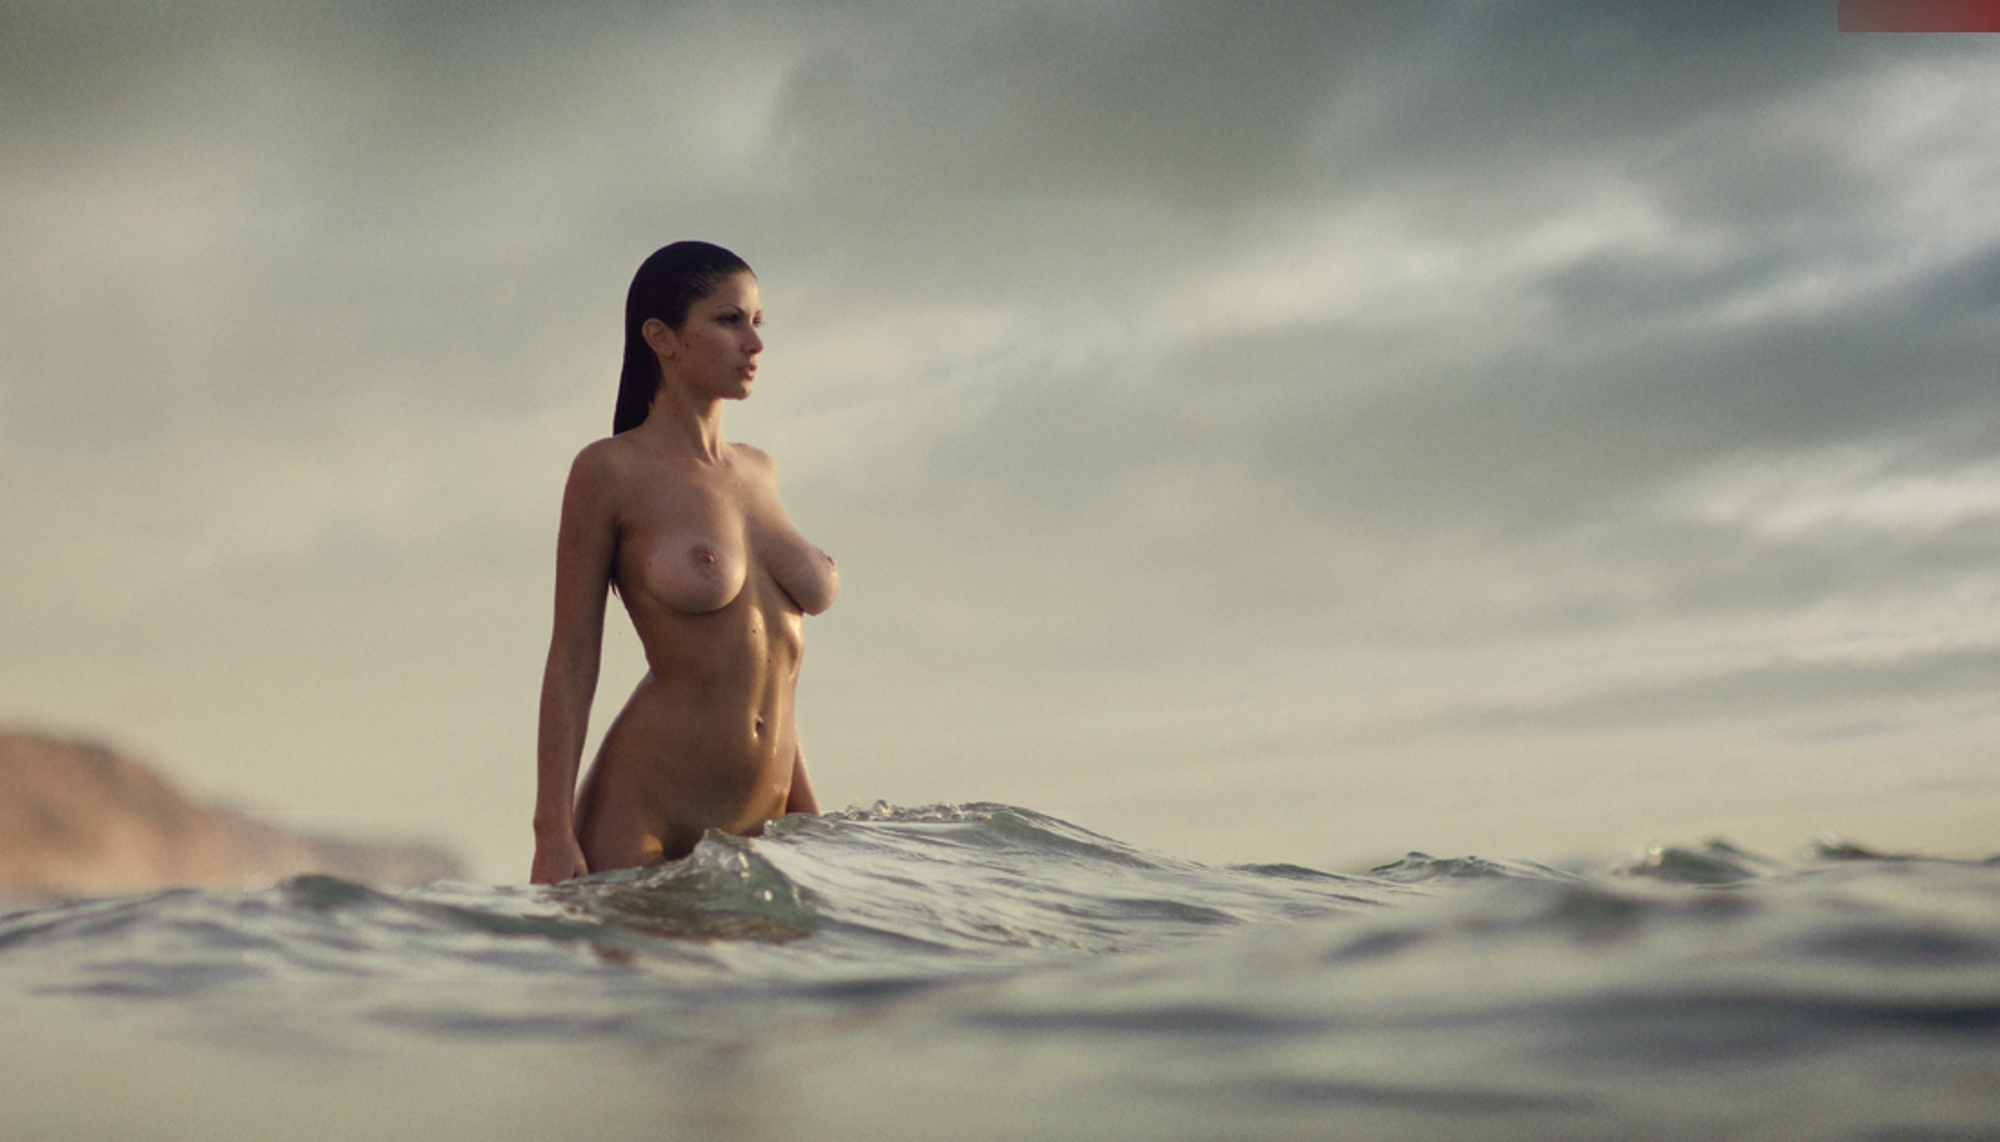 artistic boob or boobs wallpaper